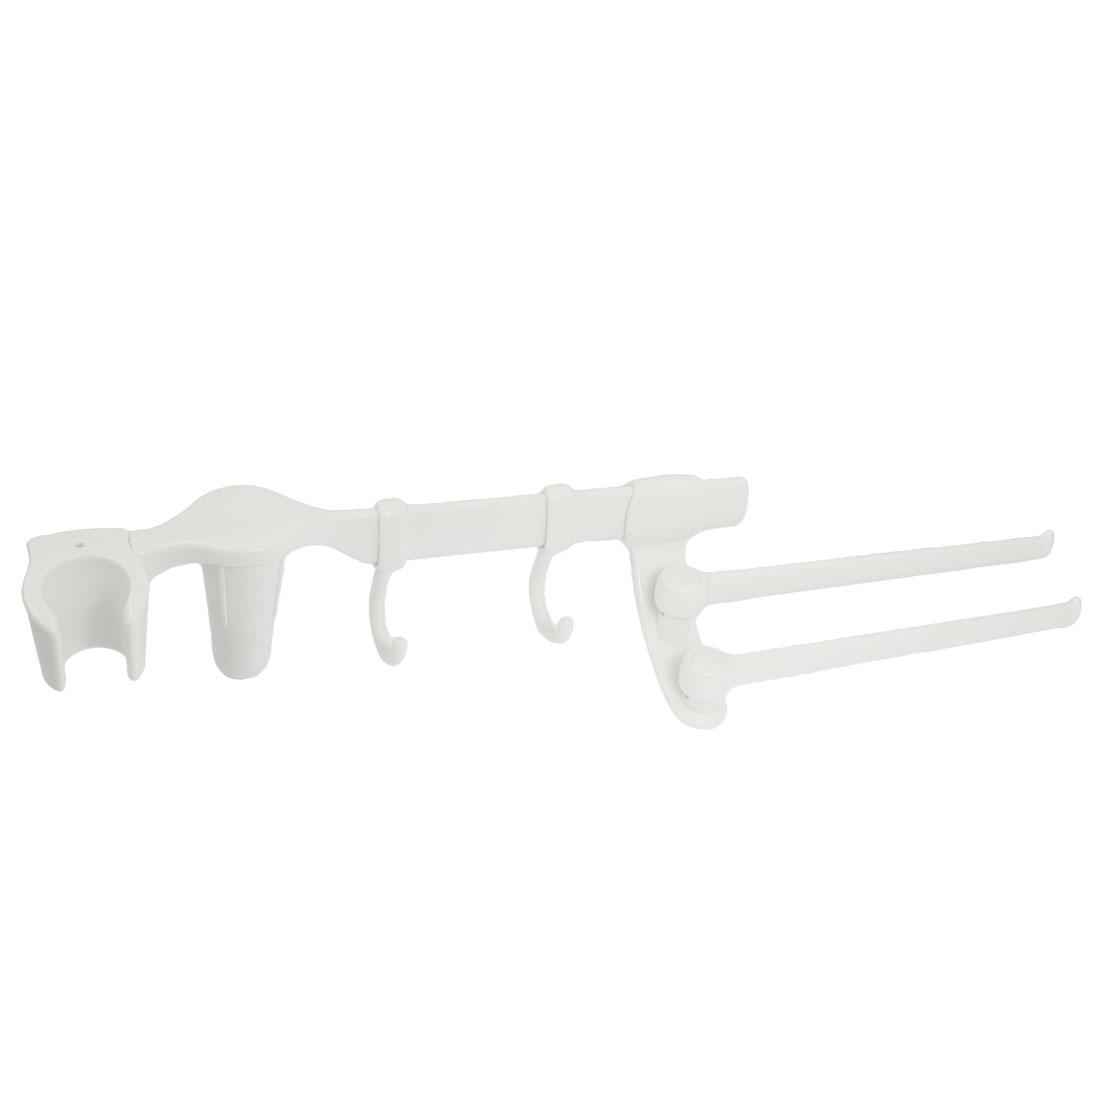 Offwhite Plastic Multi-purpose Rotatable 180Degree Towel Rack